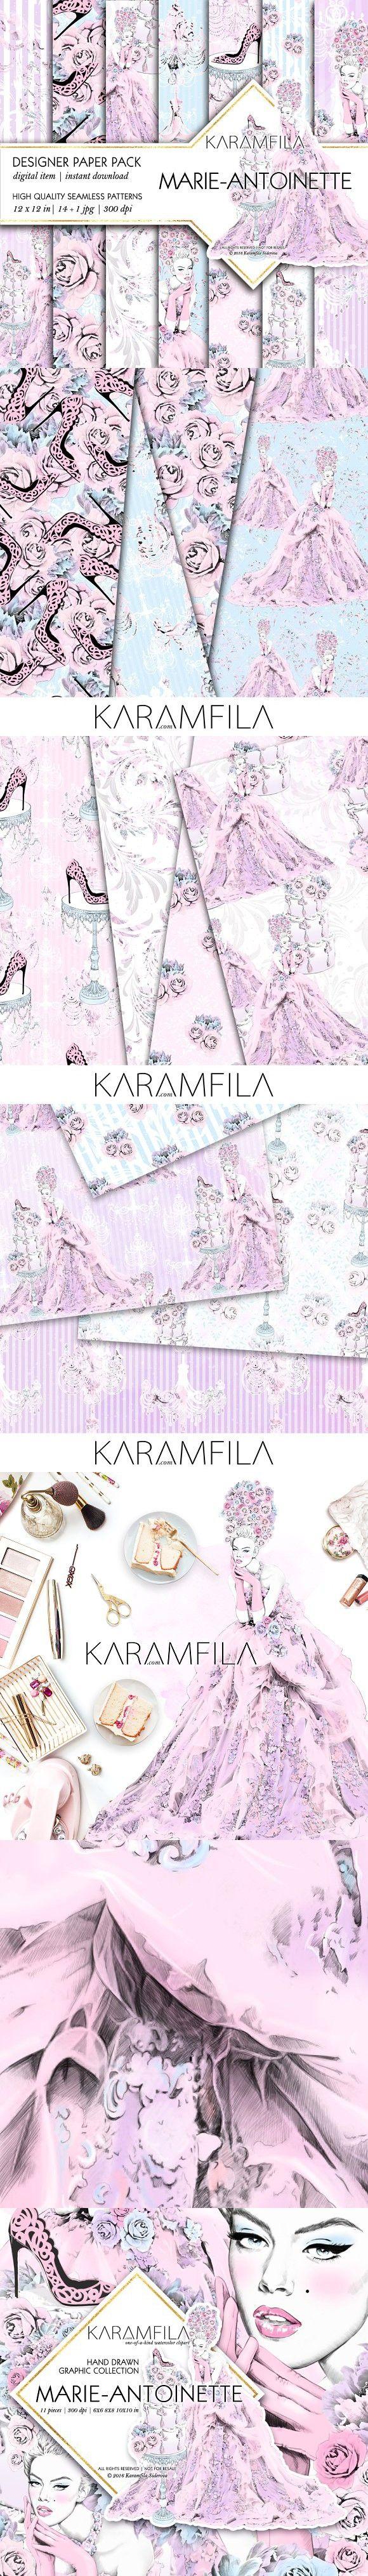 Marie-Antoinette Patterns. Wedding Card Templates